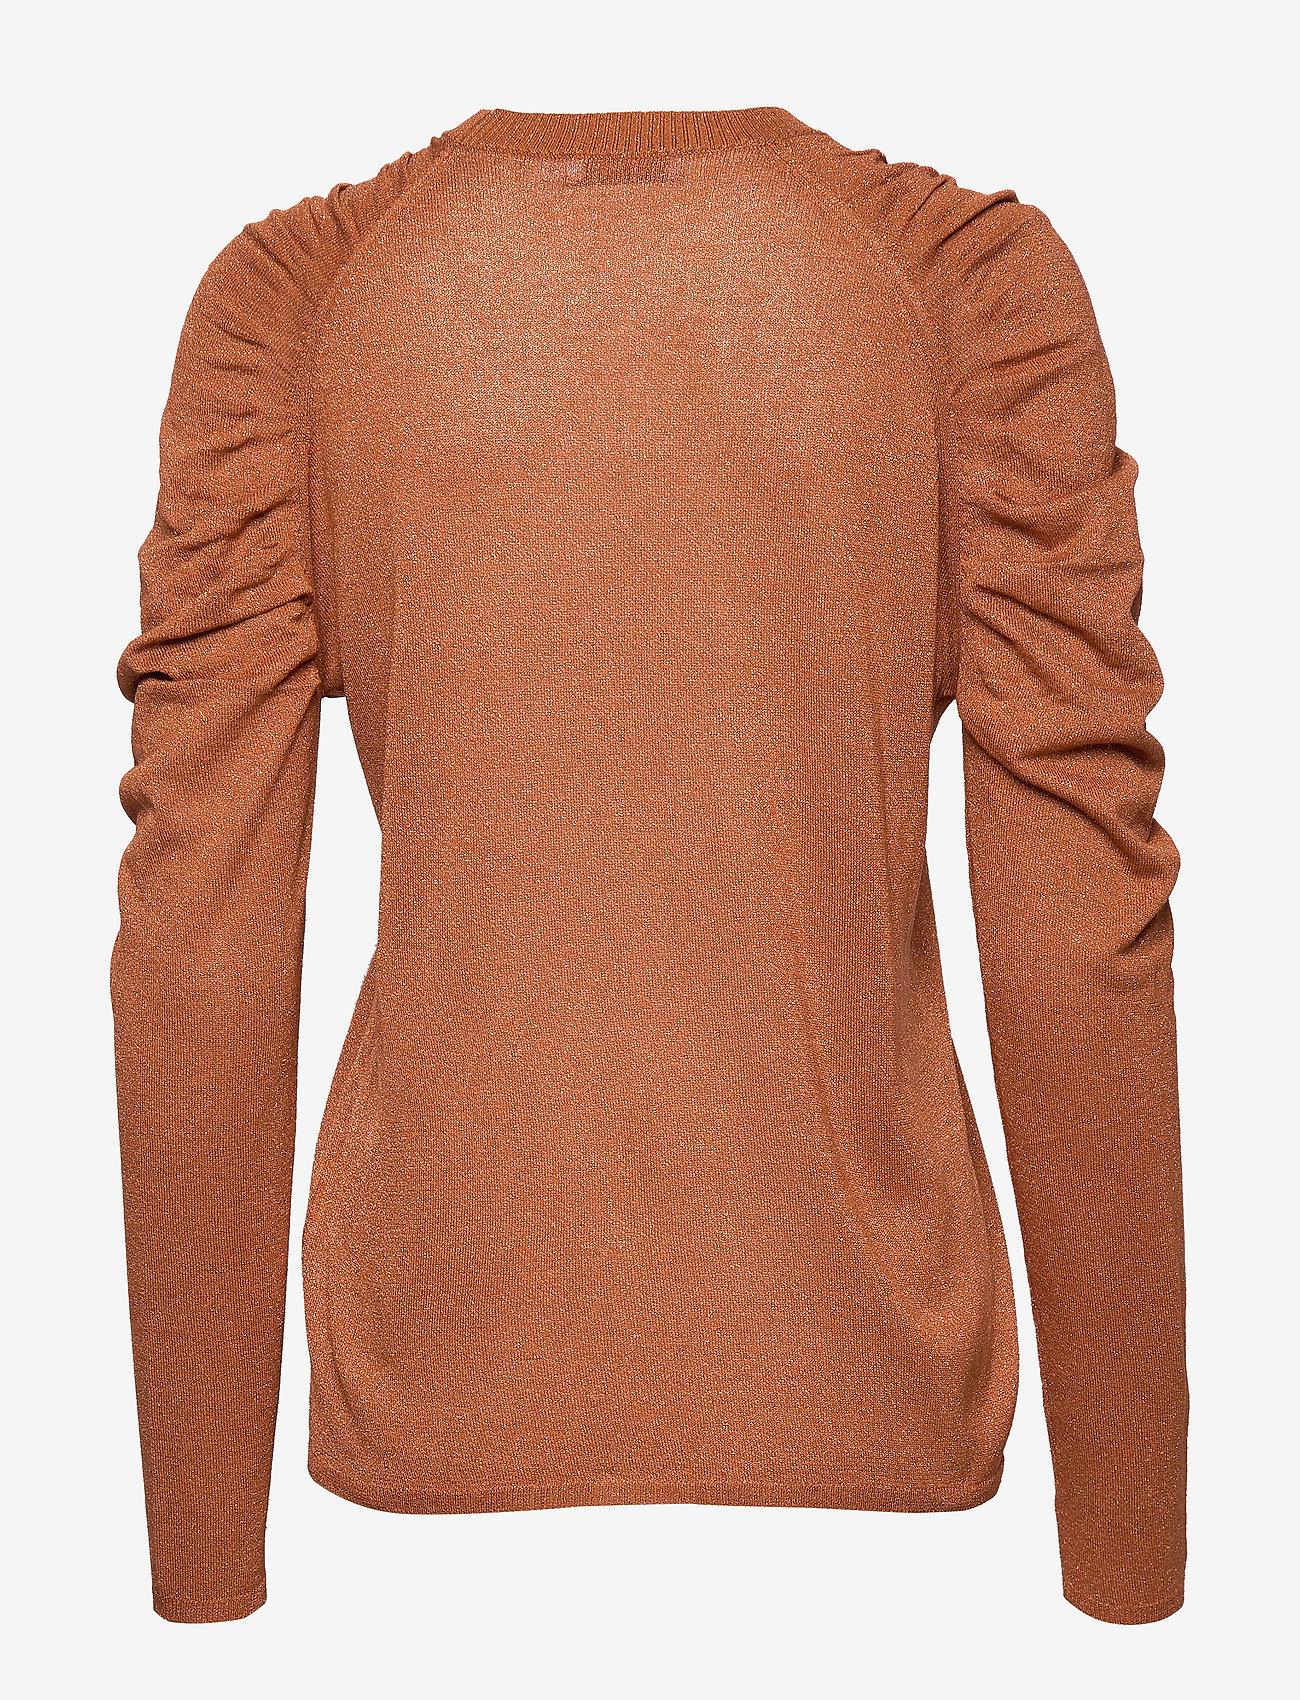 Knit In Lurex W. Volume At Shoulder (Camel) (659.40 kr) - Coster Copenhagen